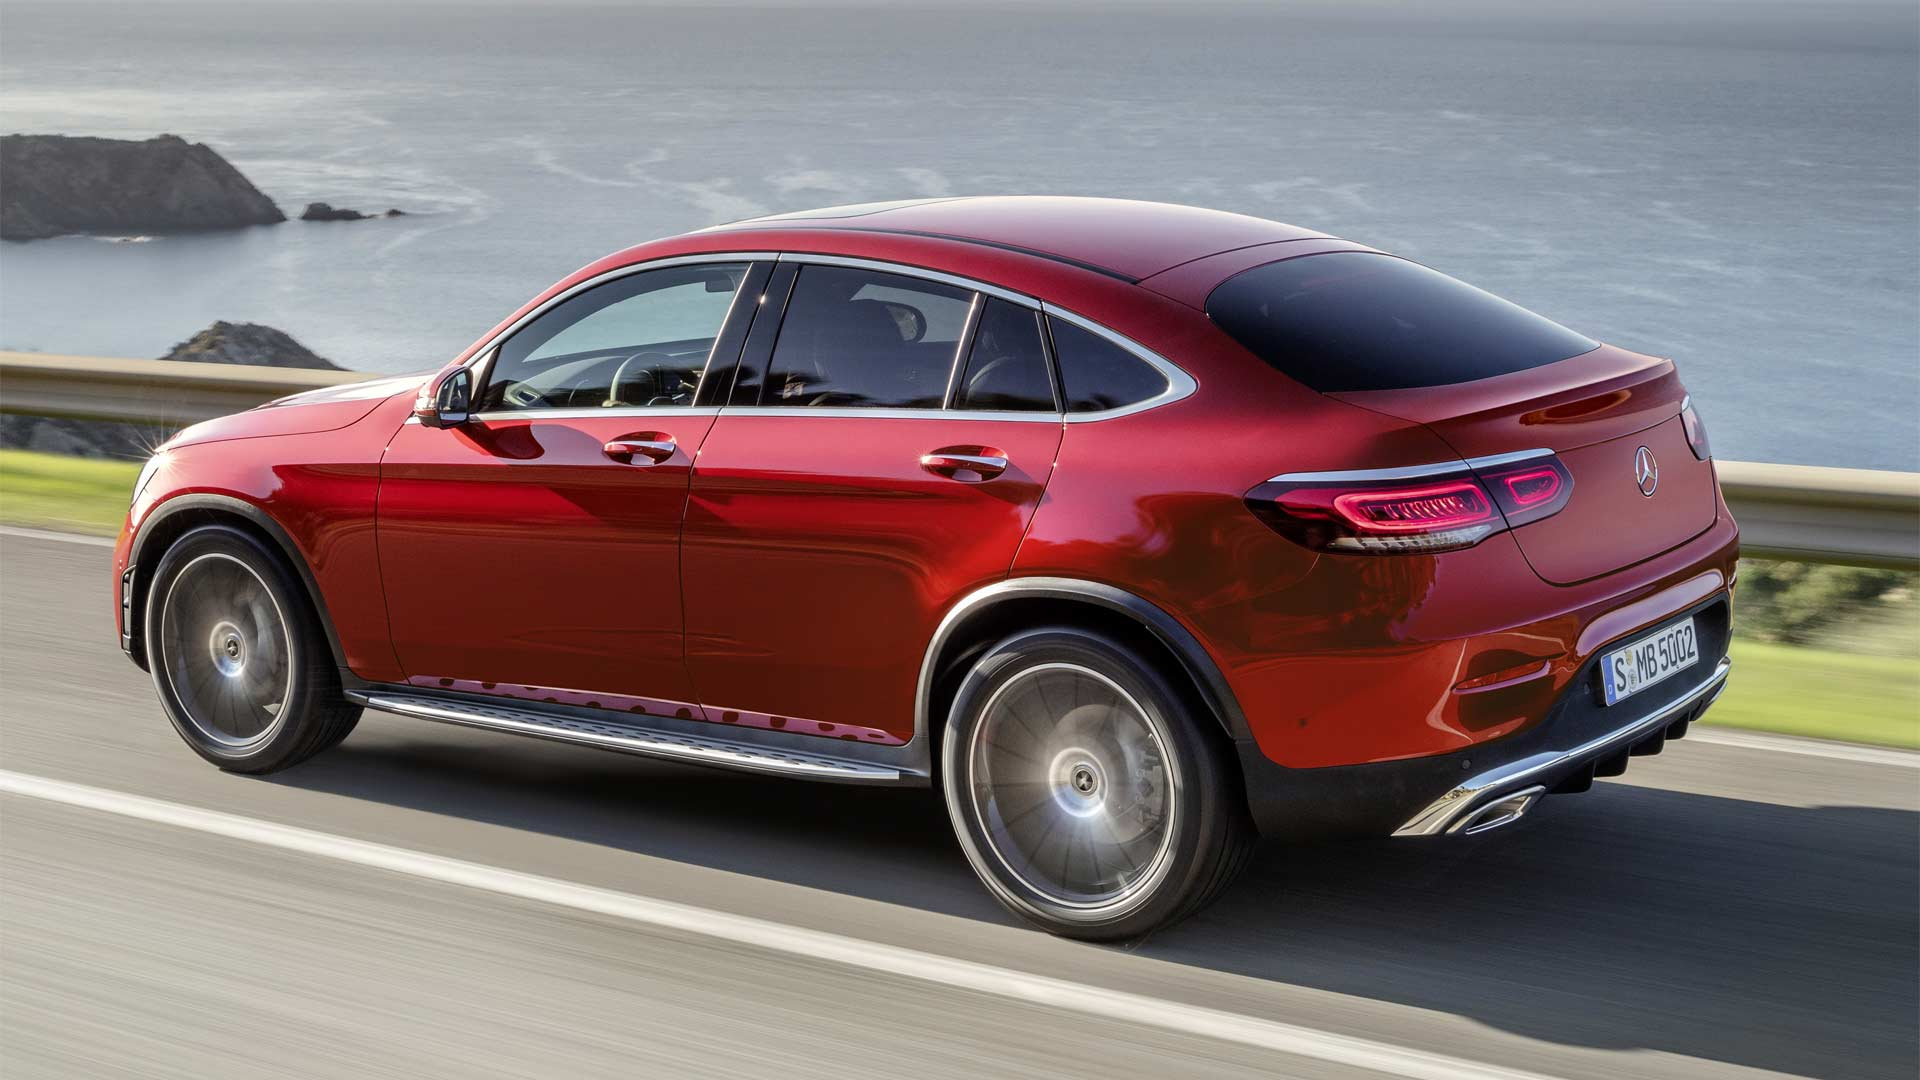 2020-Mercedes-Benz-GLC-Coupé_5